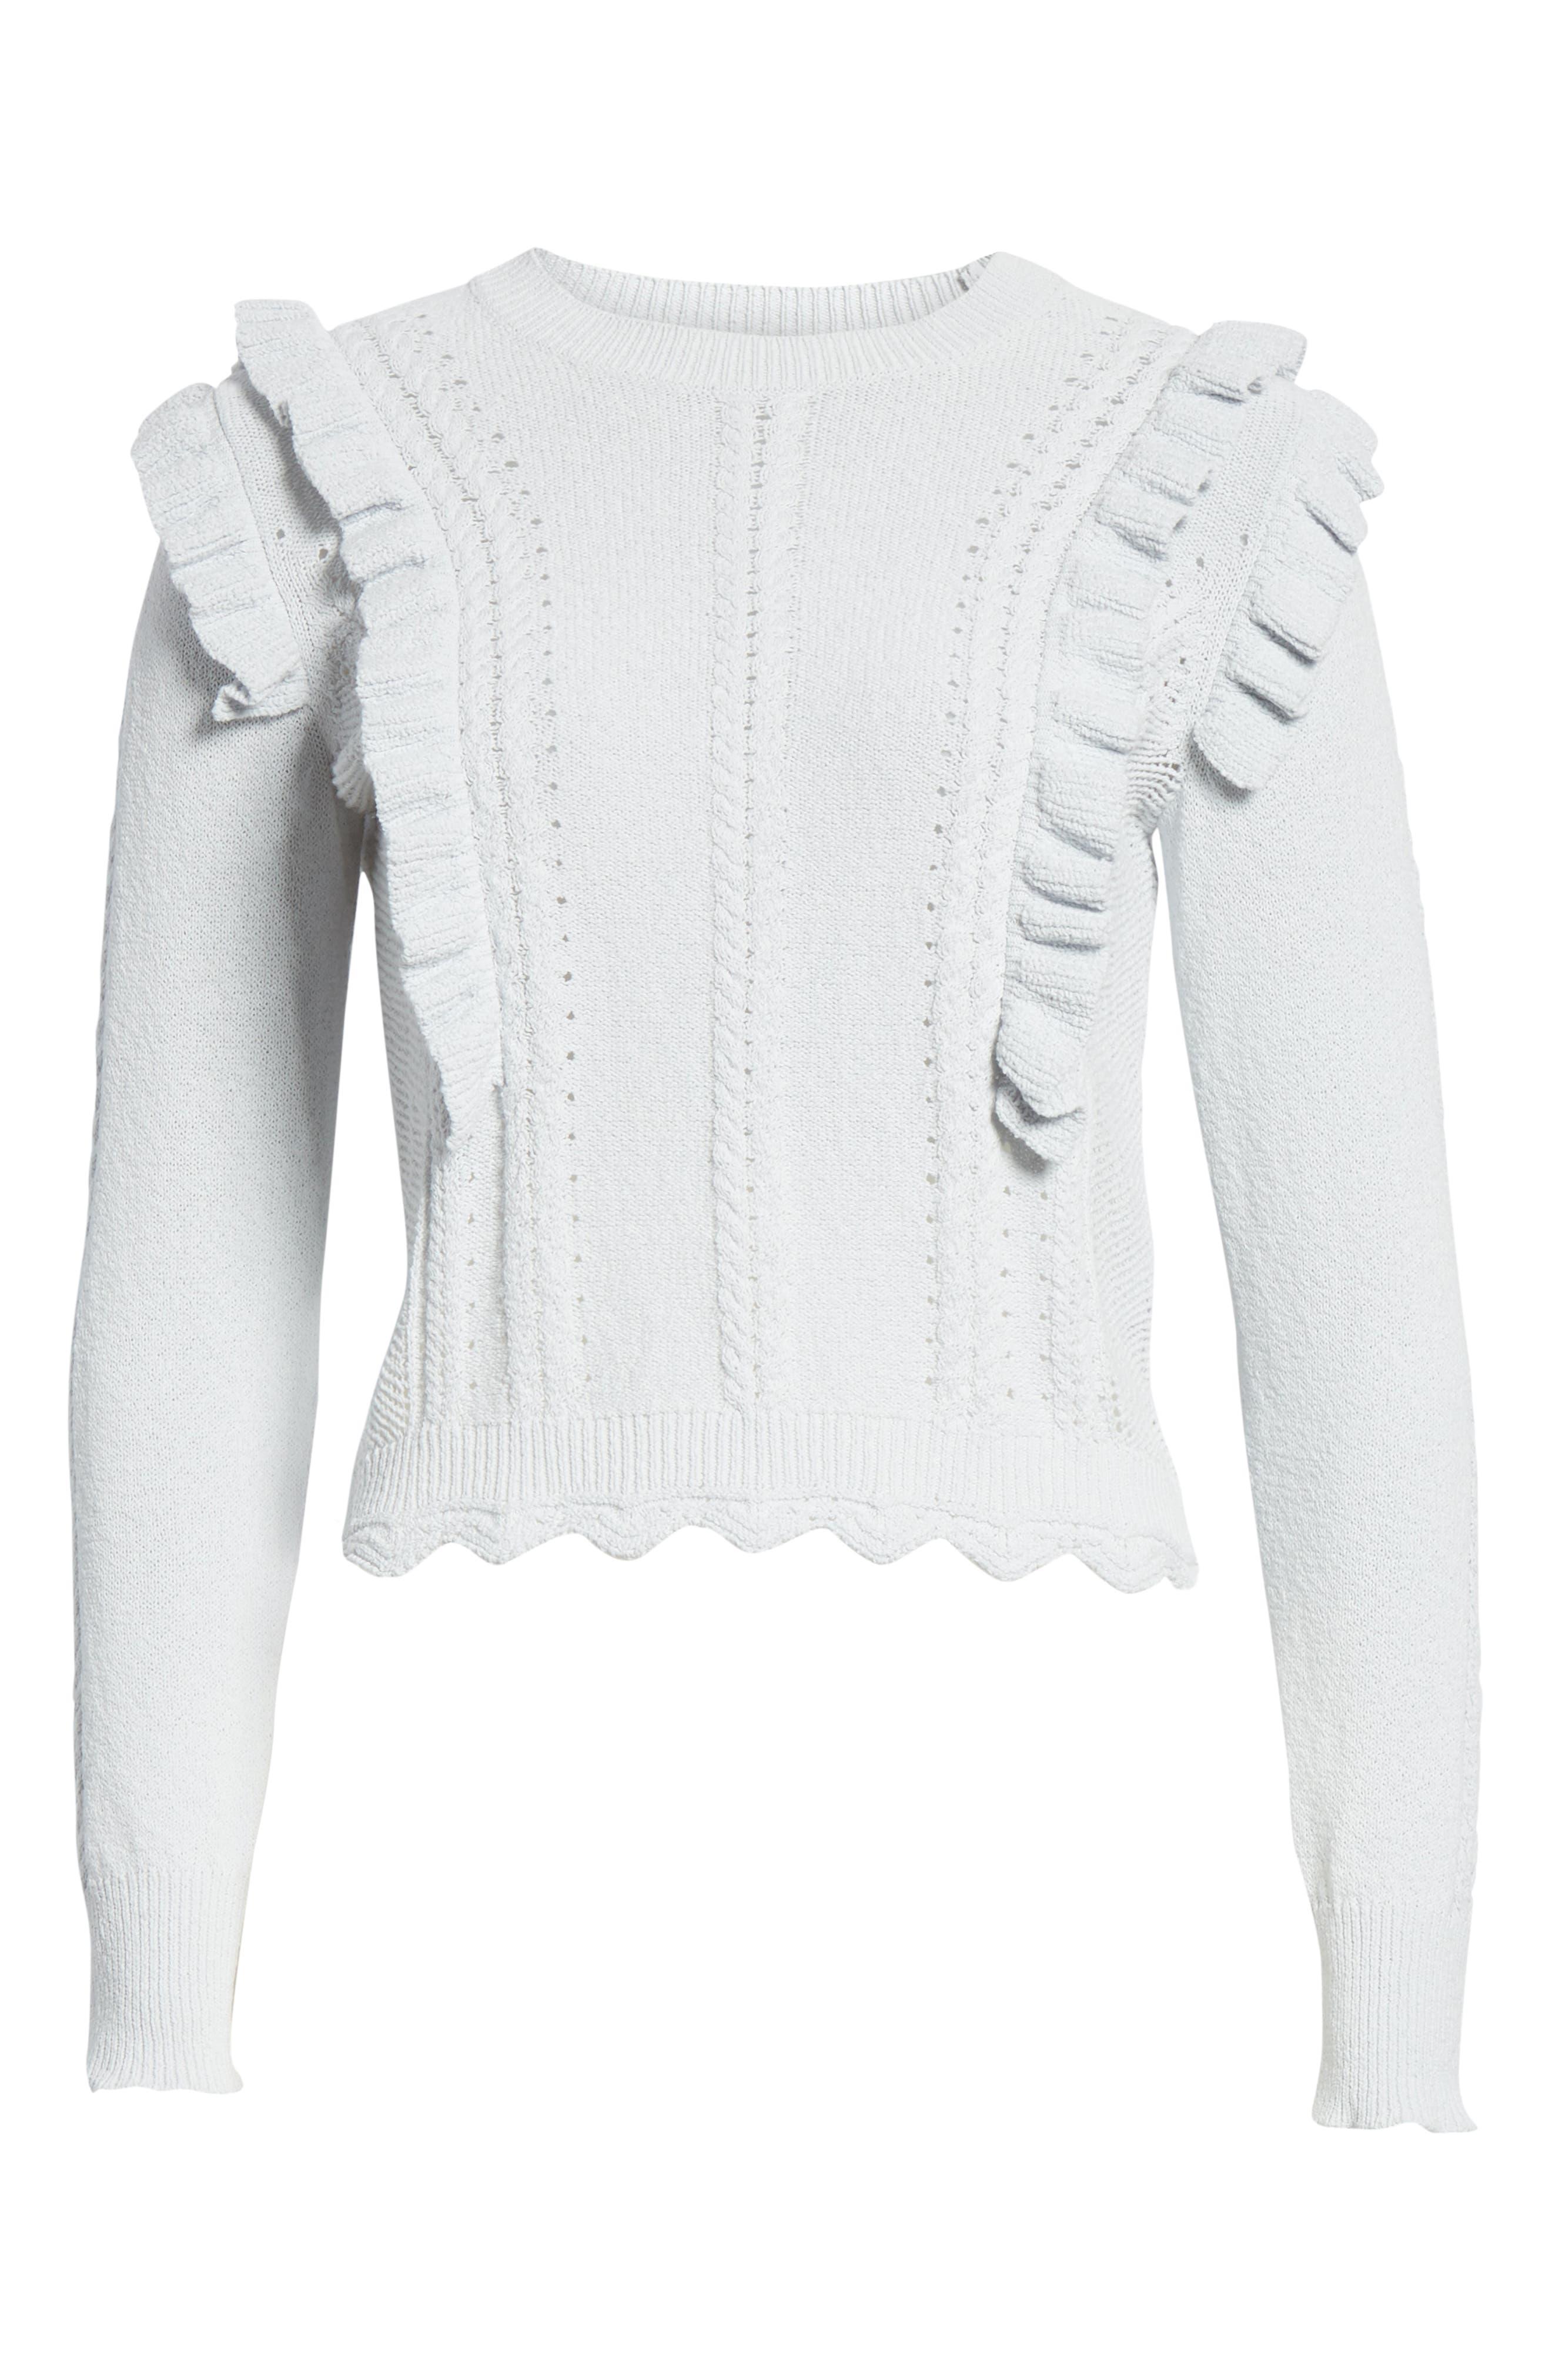 REBECCA TAYLOR, Ruffled Sweater, Alternate thumbnail 6, color, LIGHT MINT